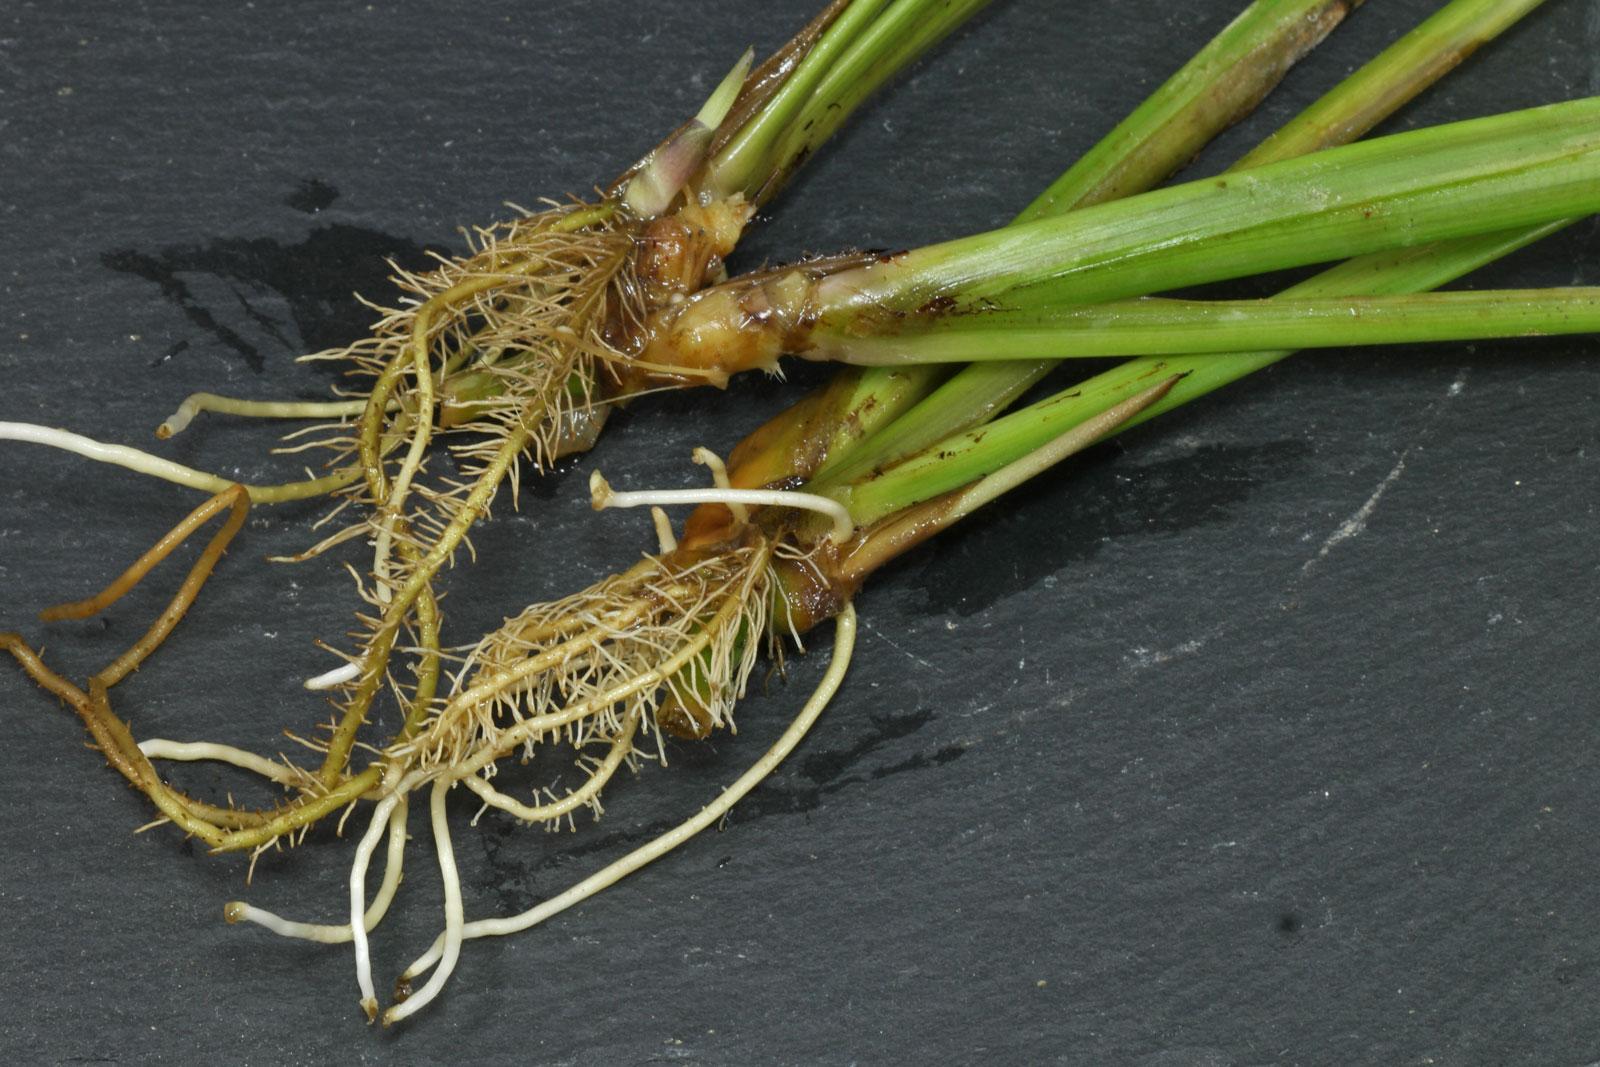 Ctenanthe marantifolia